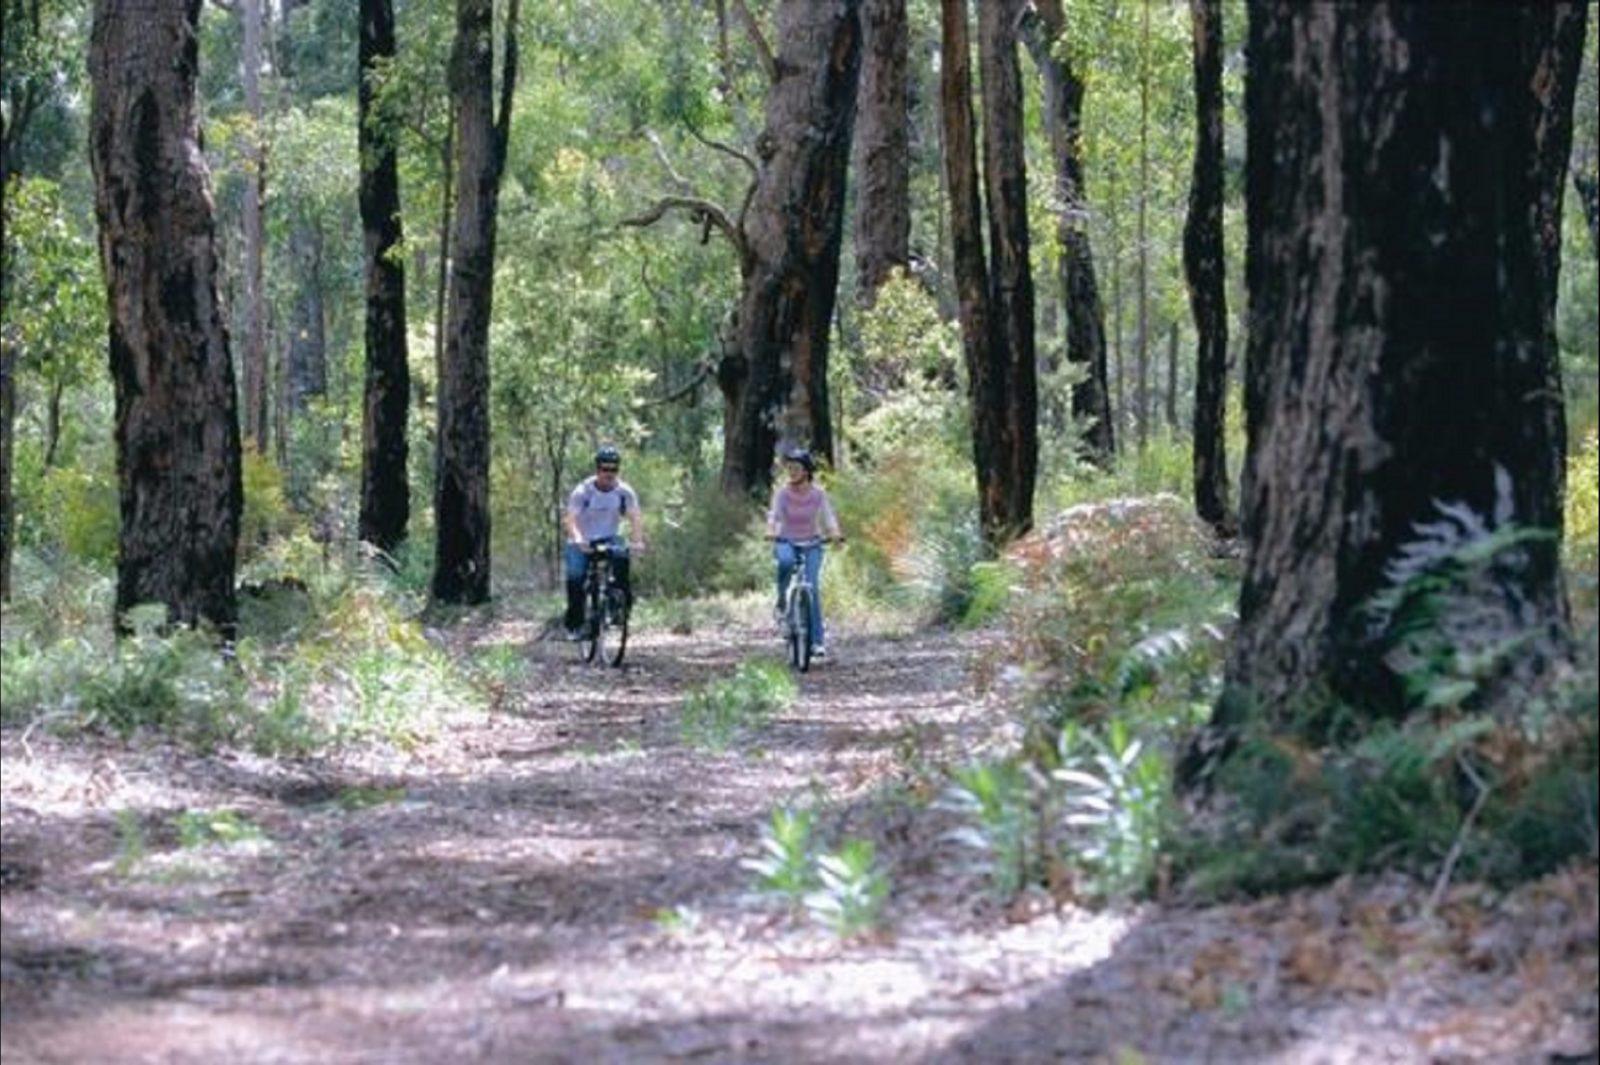 Jarrah Forest, Wellington National Park